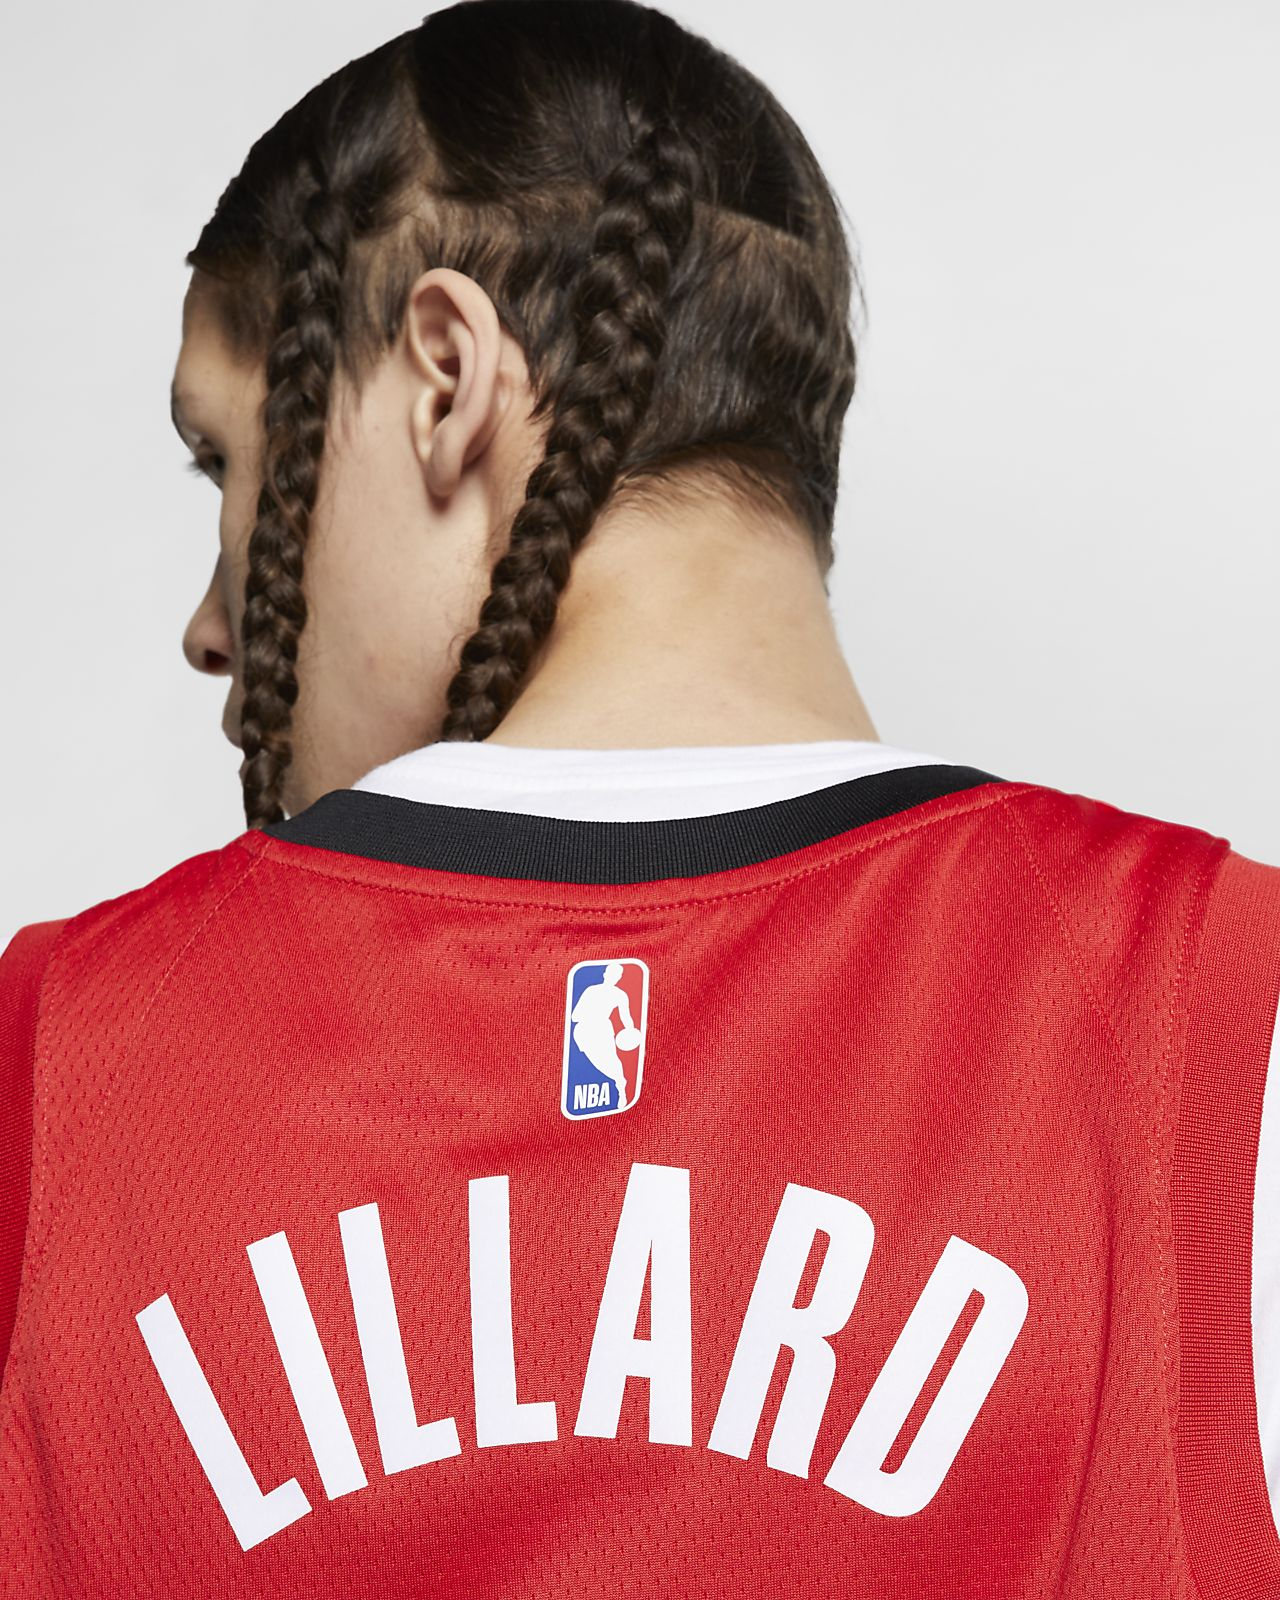 c2483cad1 ... Camiseta conectada Nike NBA para hombre Damian Lillard Earned City  Edition Swingman (Portland Trail Blazers